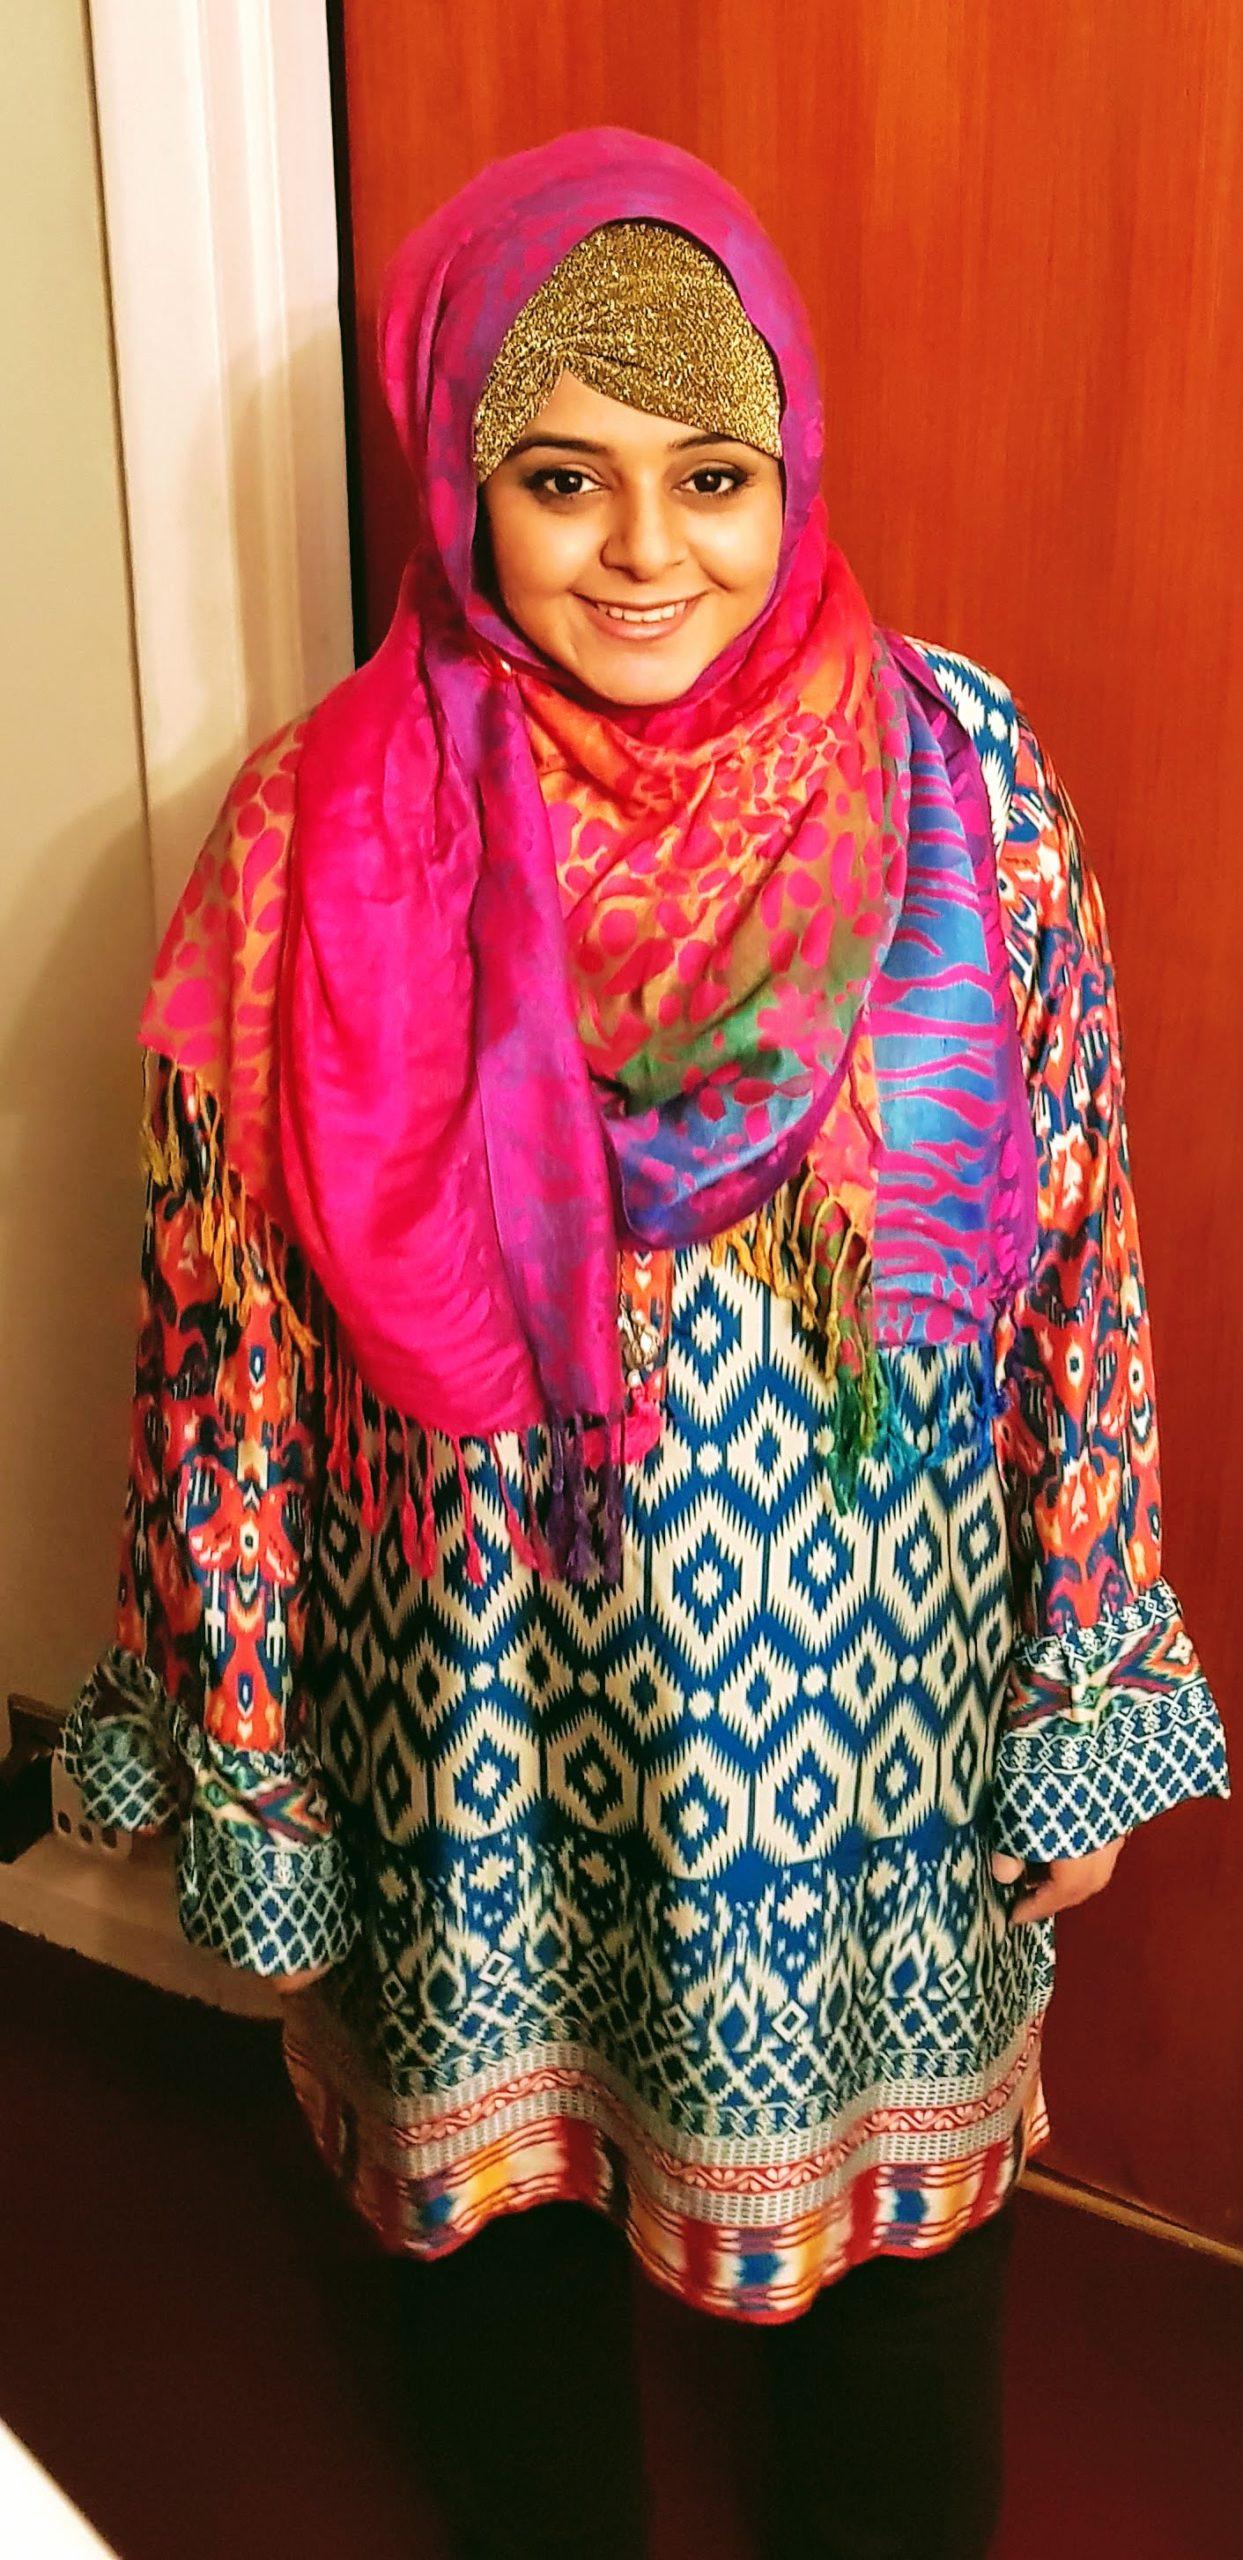 Fatima Taqvi